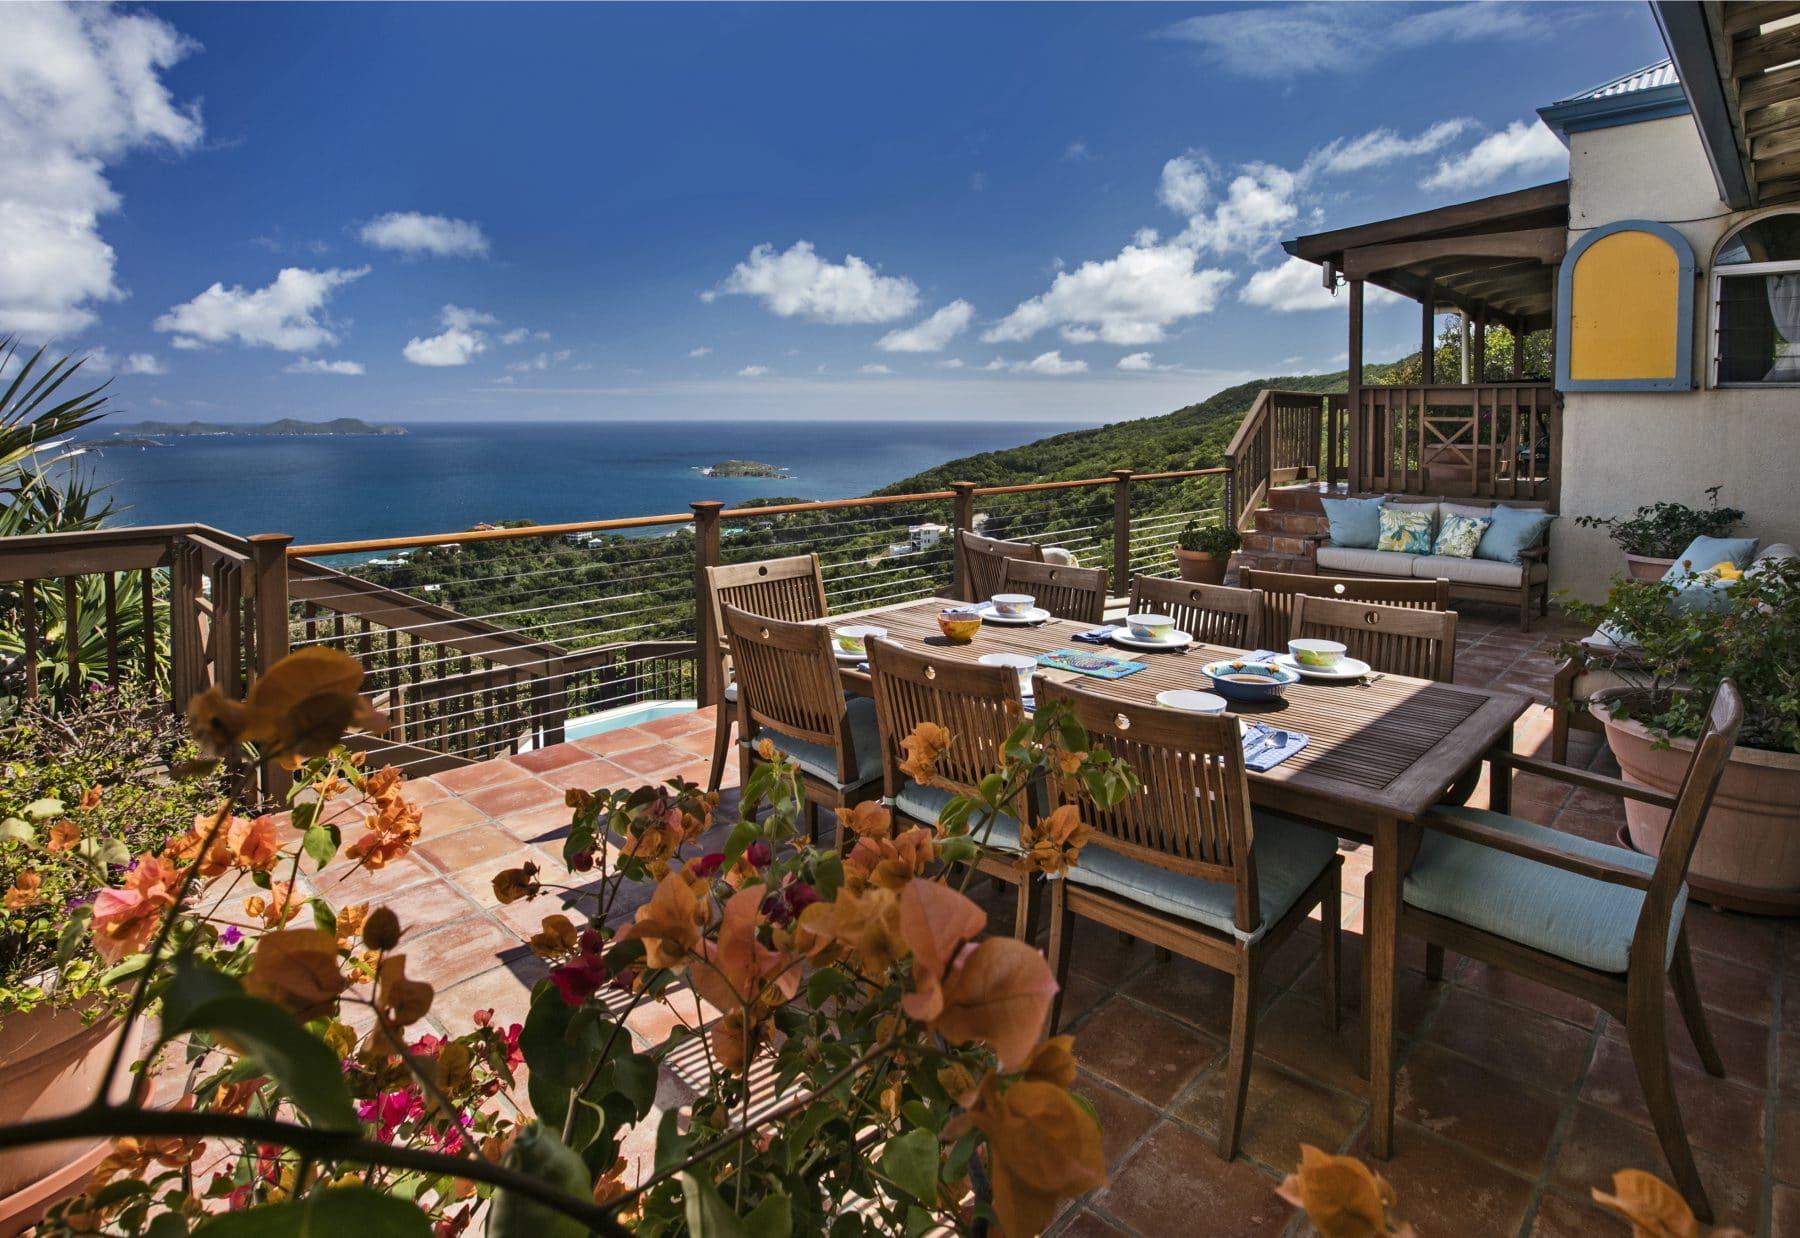 virgin islands vacation rentals PalladiosViews tea